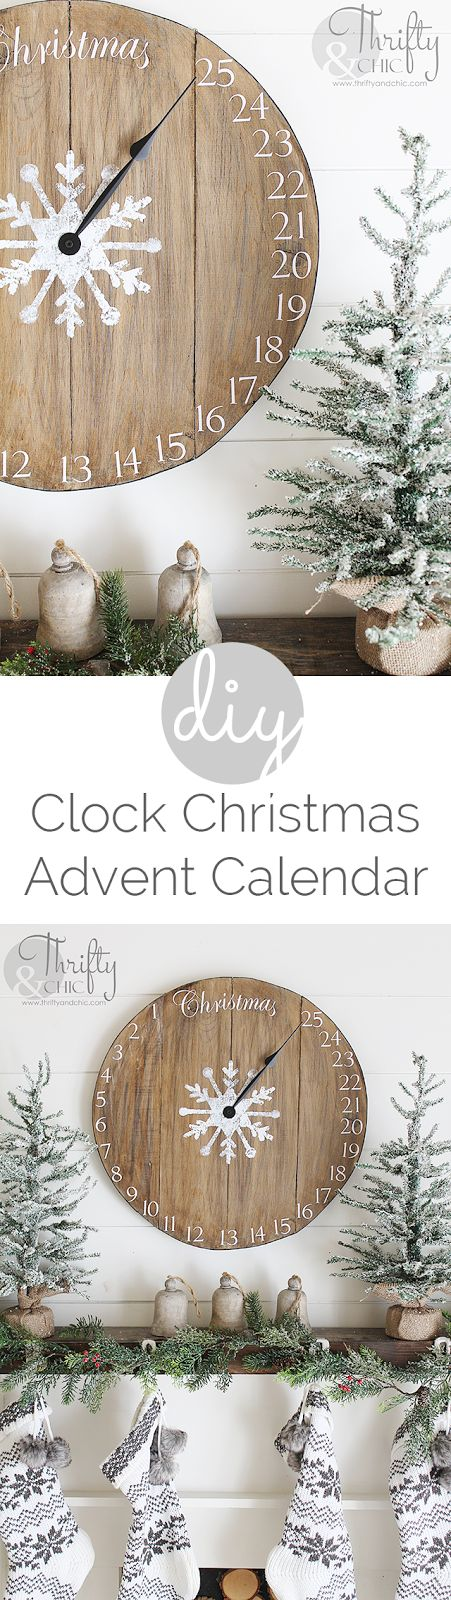 DIY wood clock Christmas advent calendar! Great rustic farmhouse Christmas decor!                                                                                                                                                                                 More